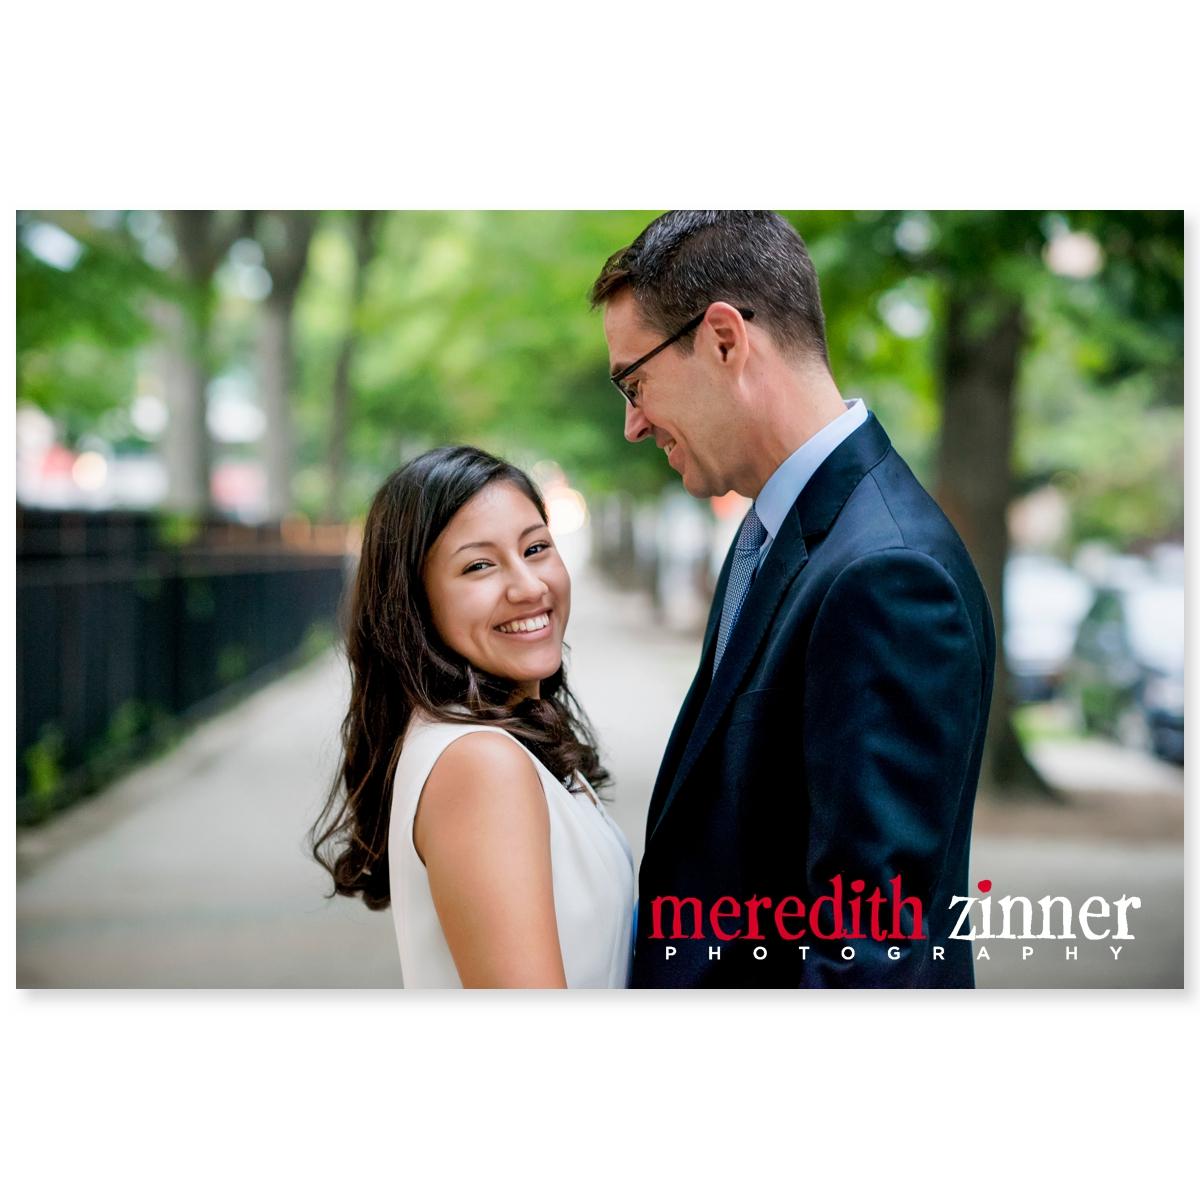 Meredith_Zinner_Photography_StilesCelebration_0240